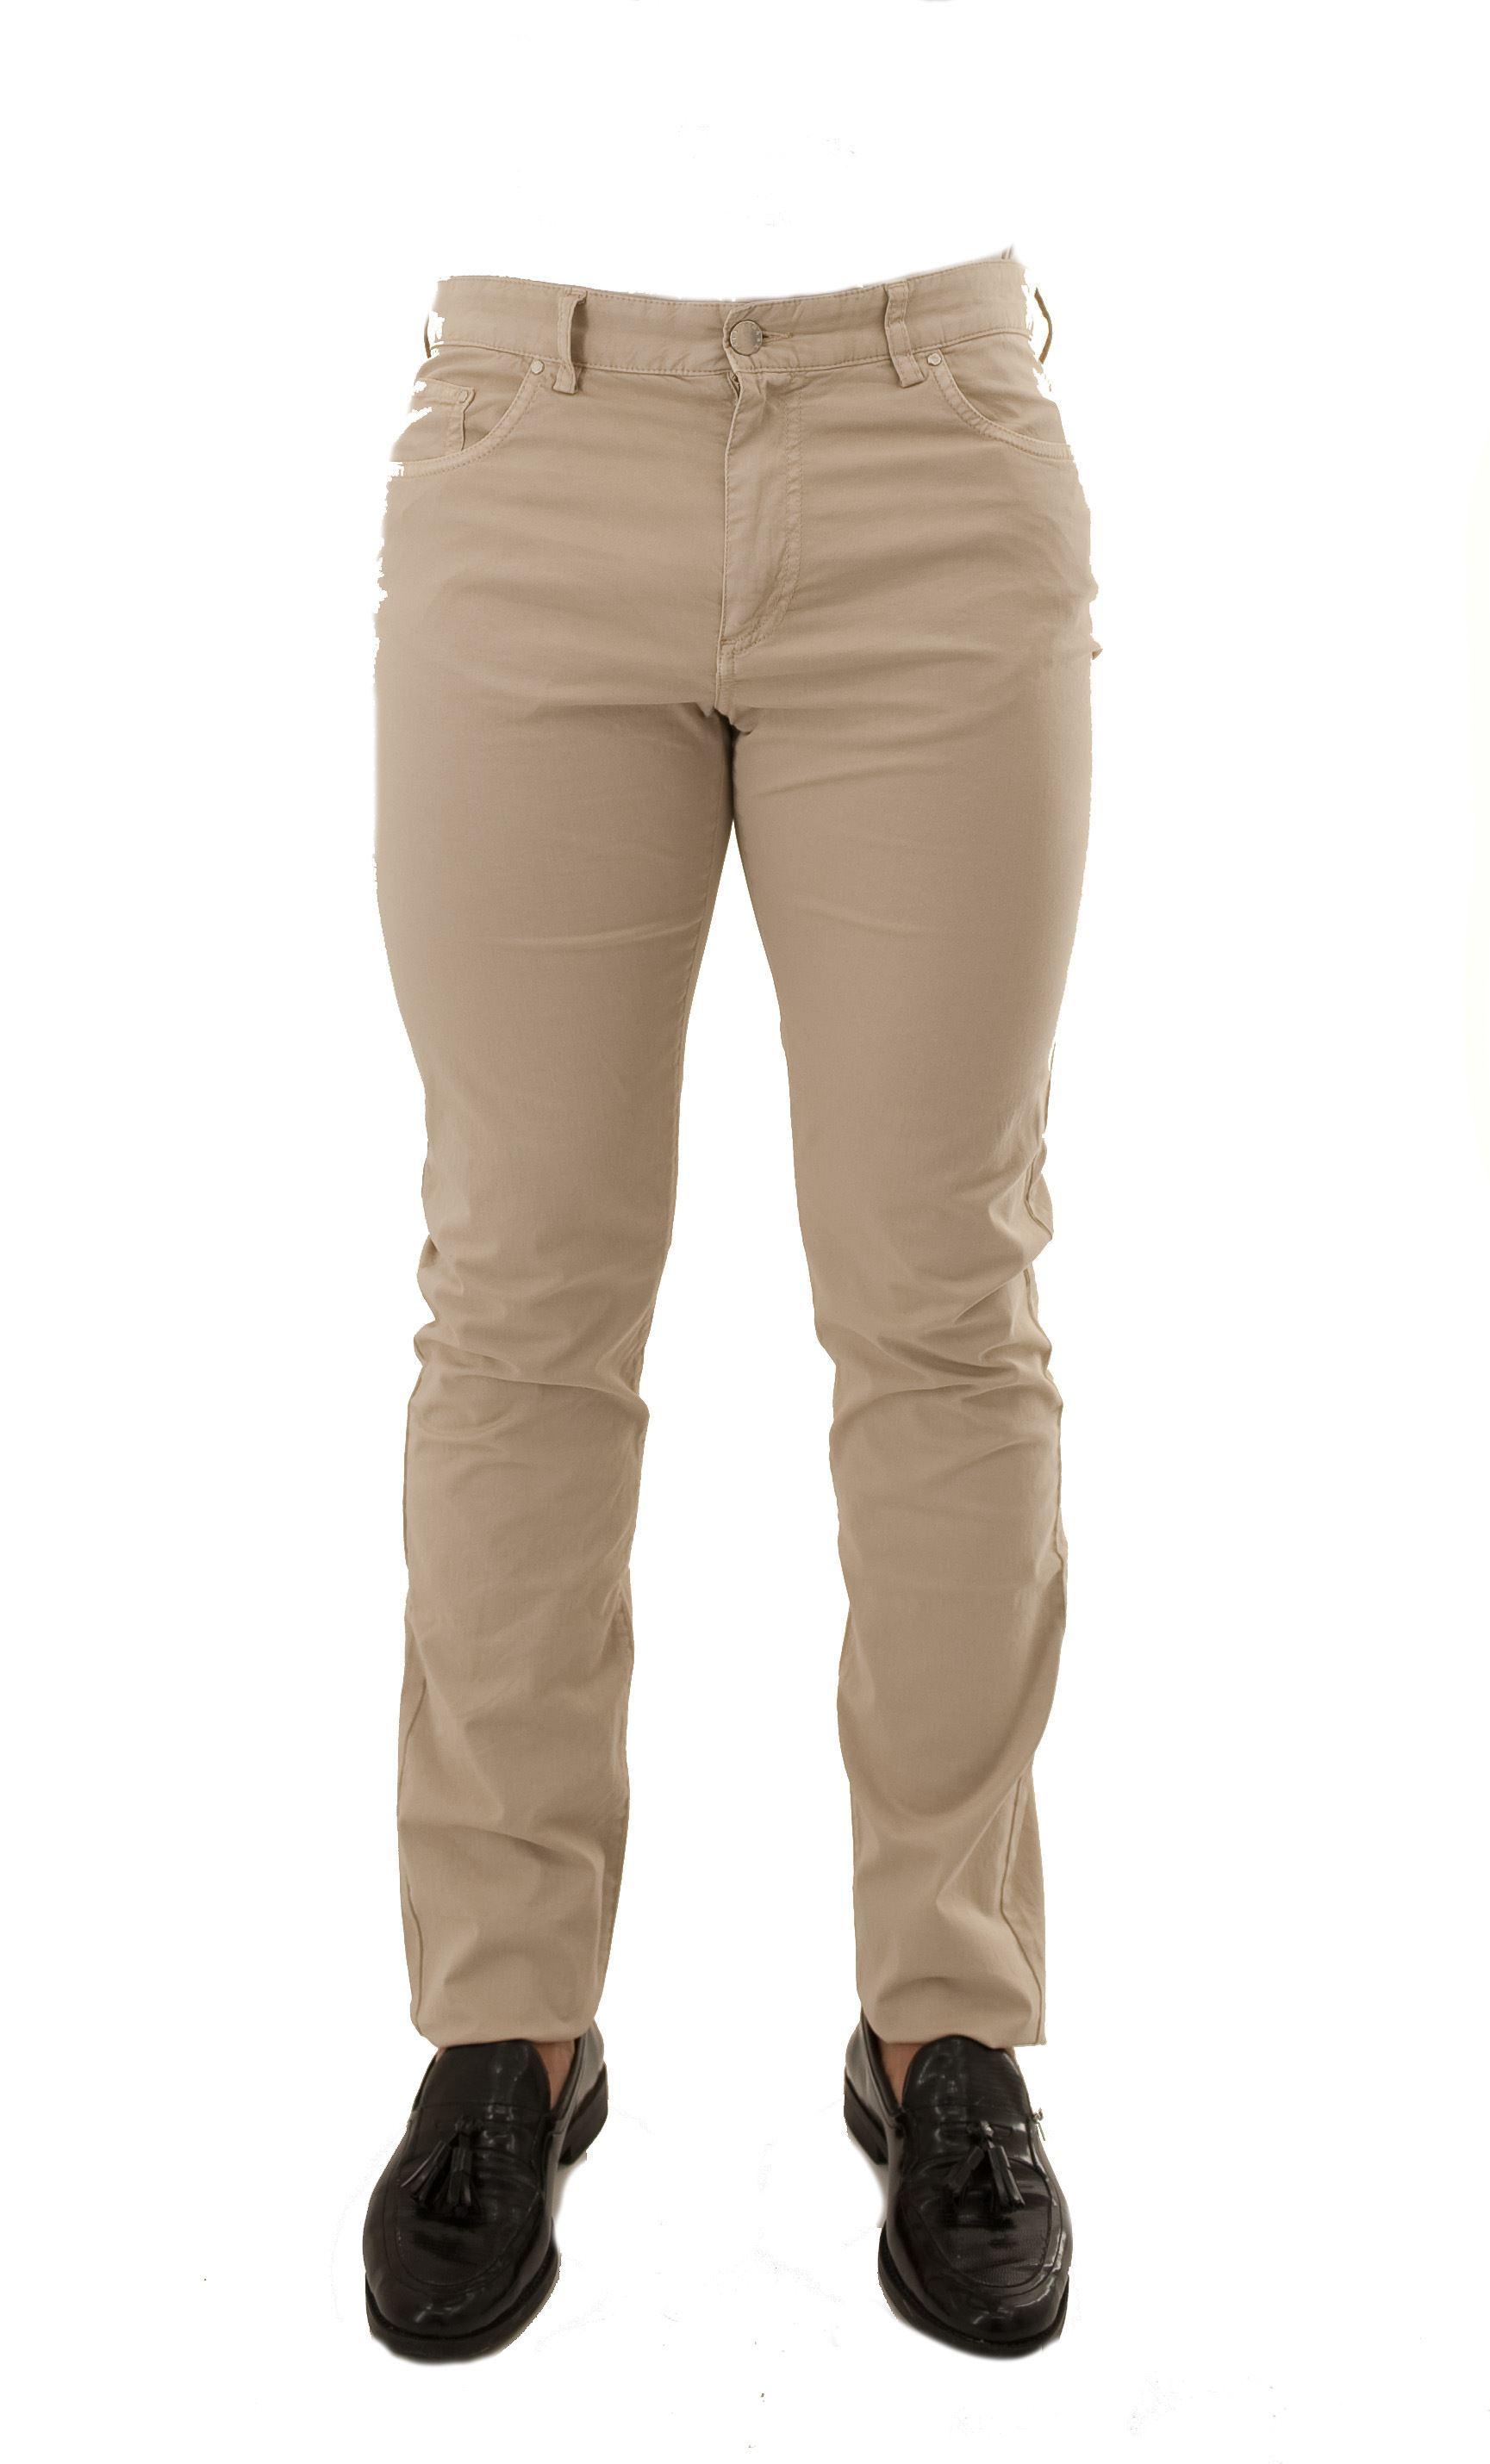 Immagine di Pantalone in cotone 5 tasche